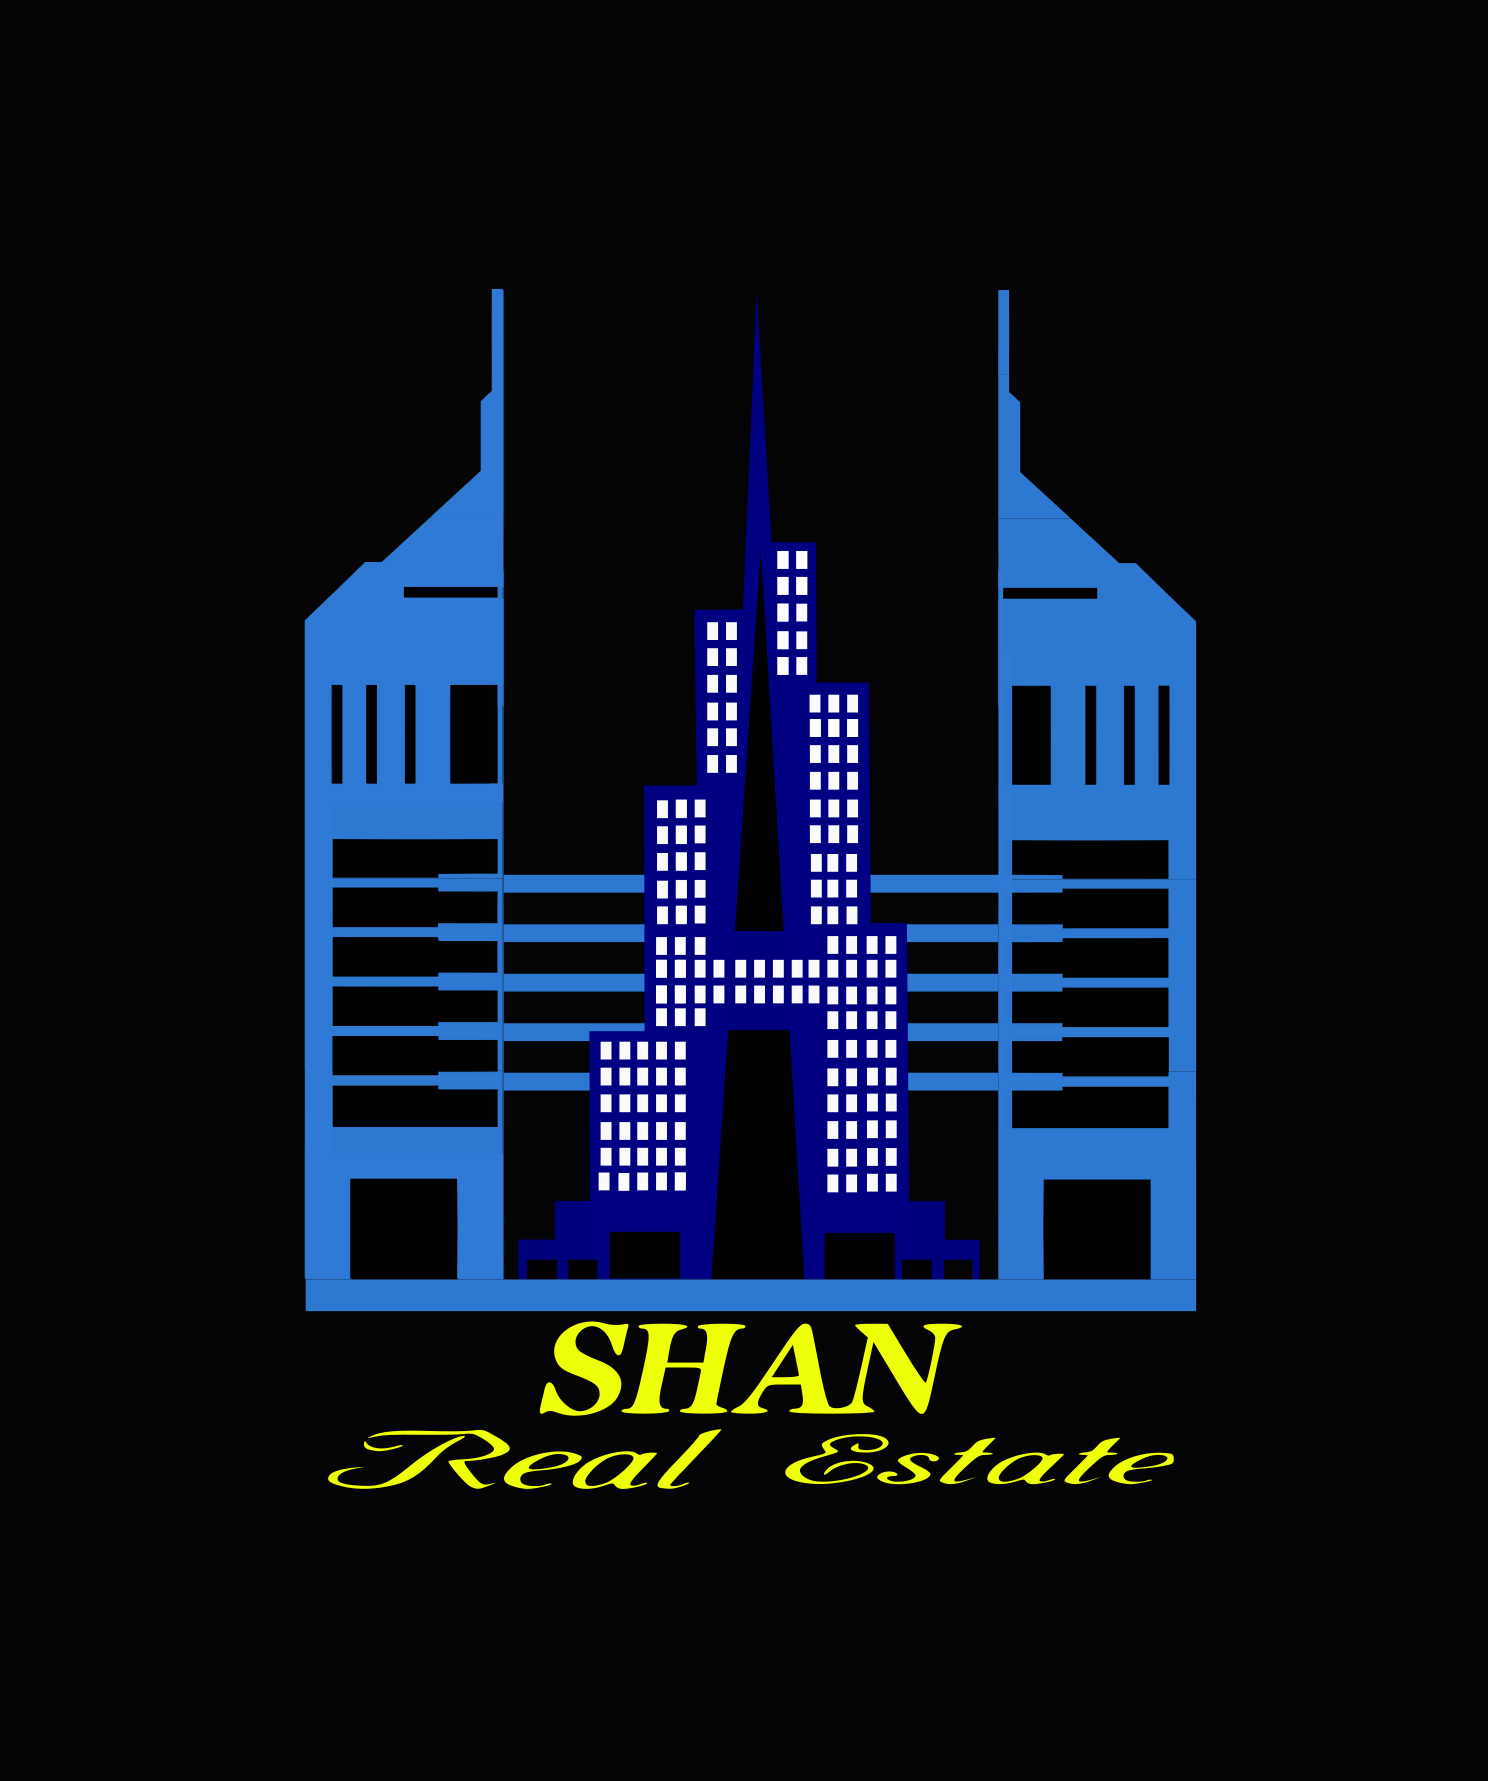 Логотип для агенство недвижемоти ШАН в Эмиратах. фото f_1345b77ccd957b34.png